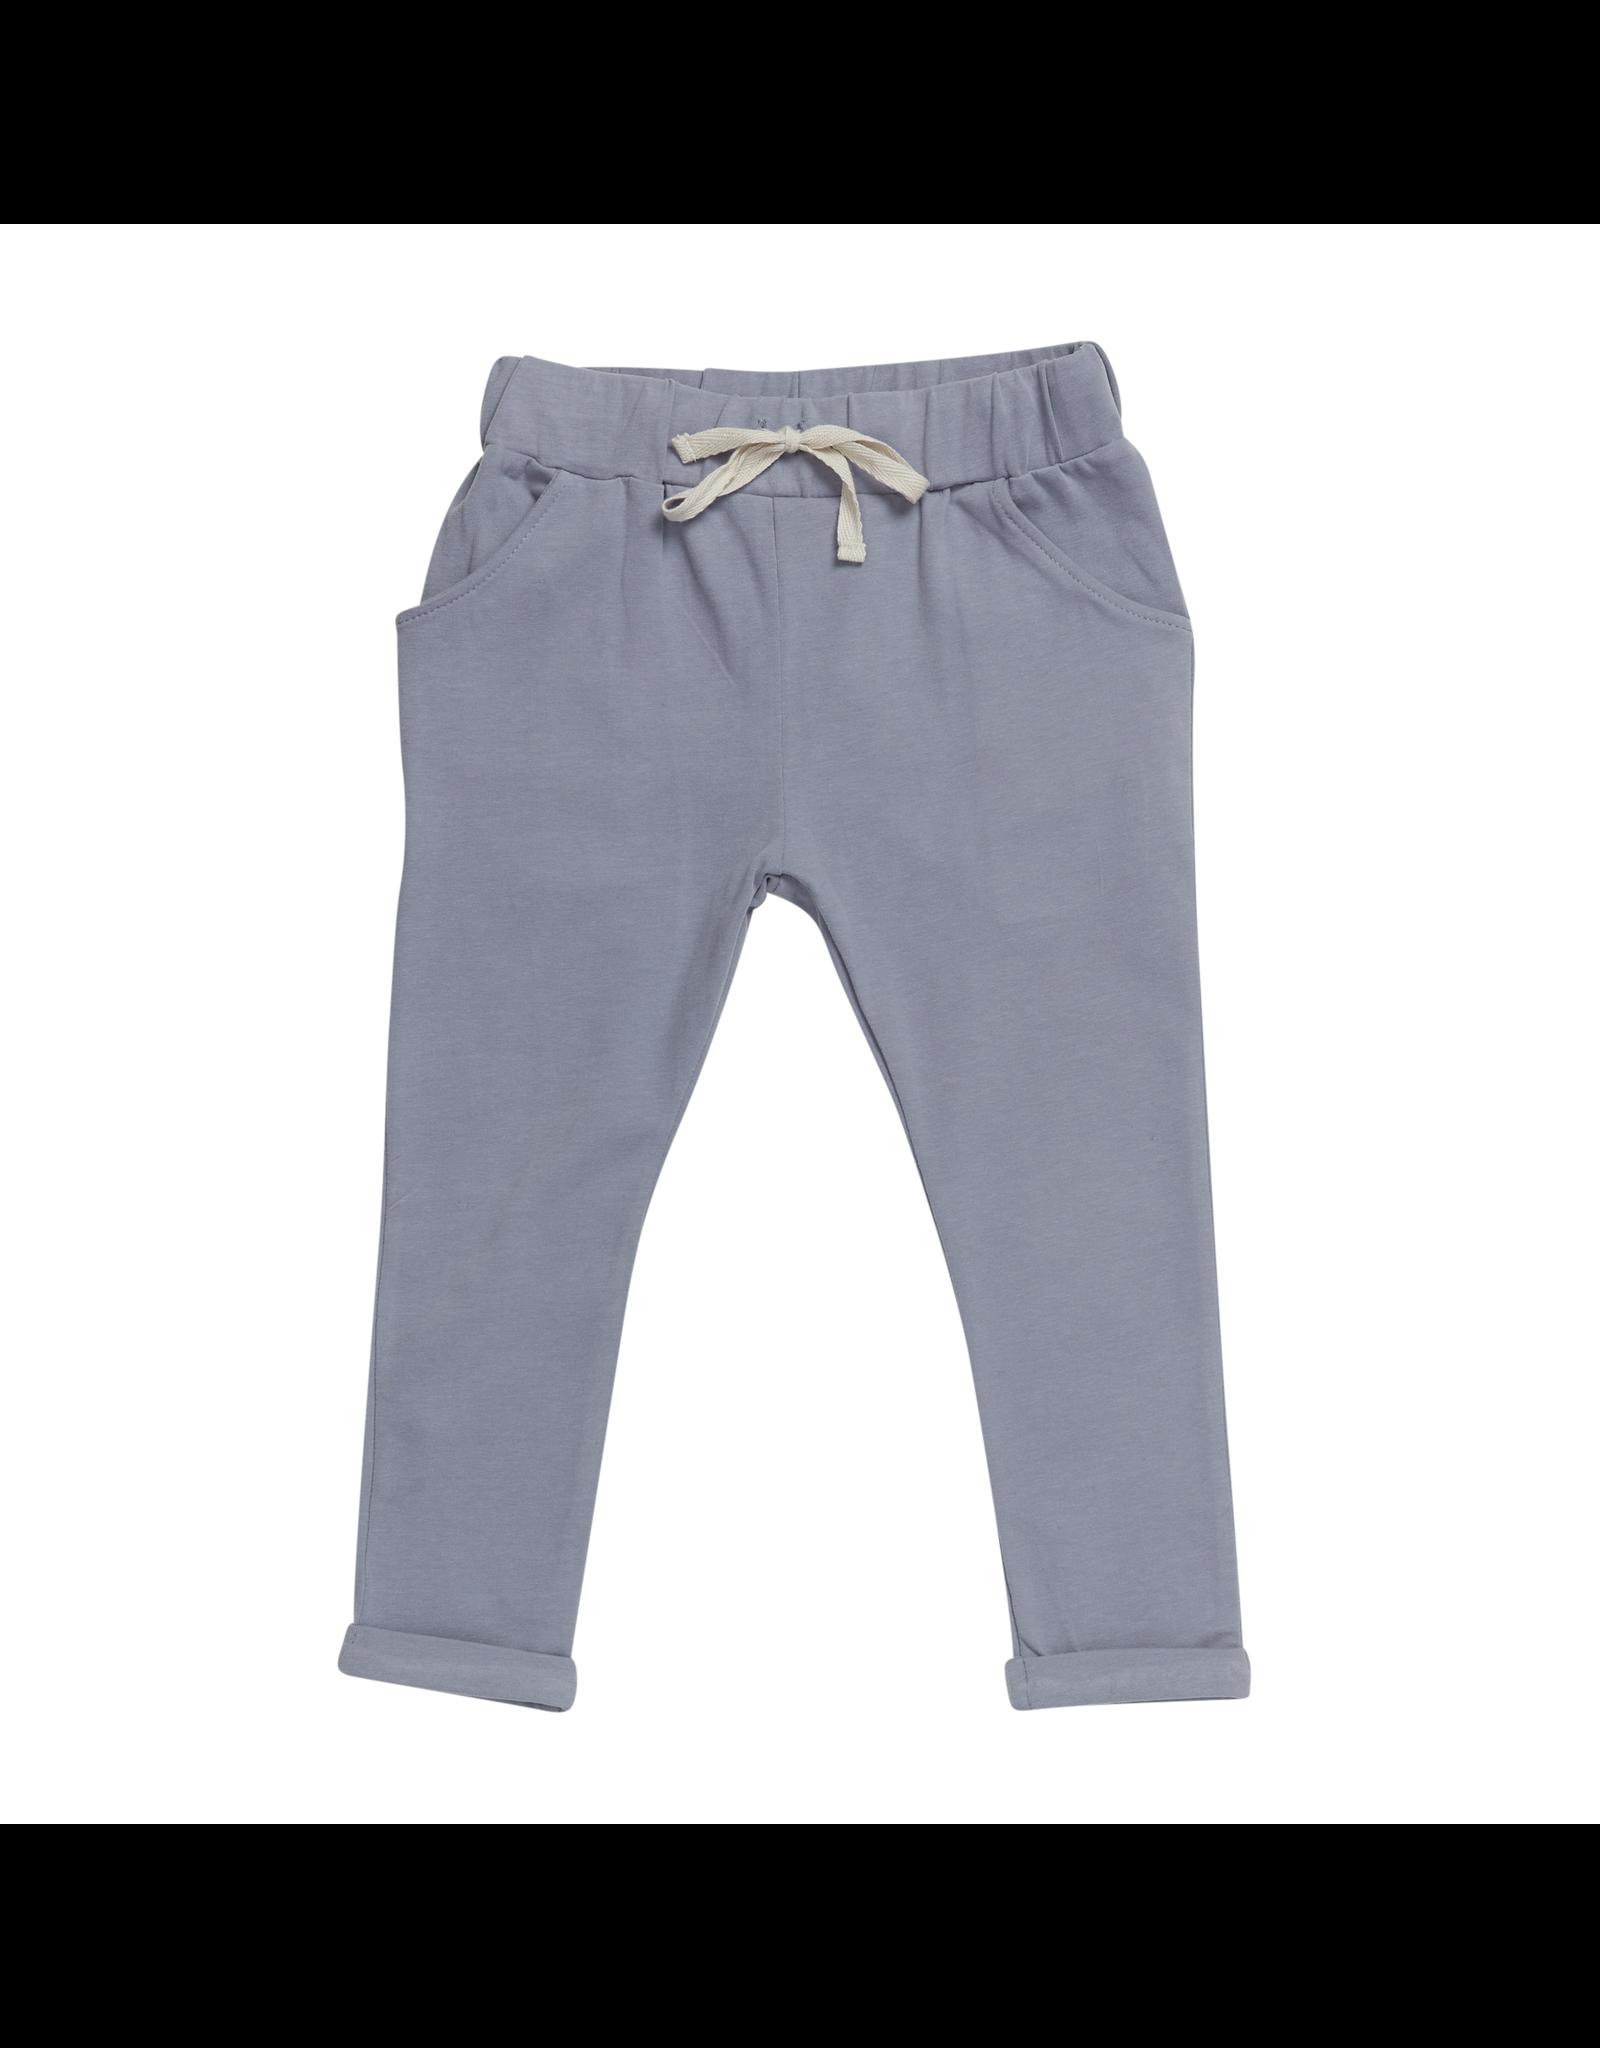 Blossom Kids Blossom Kids - Strap cord joggers - Blue Grey